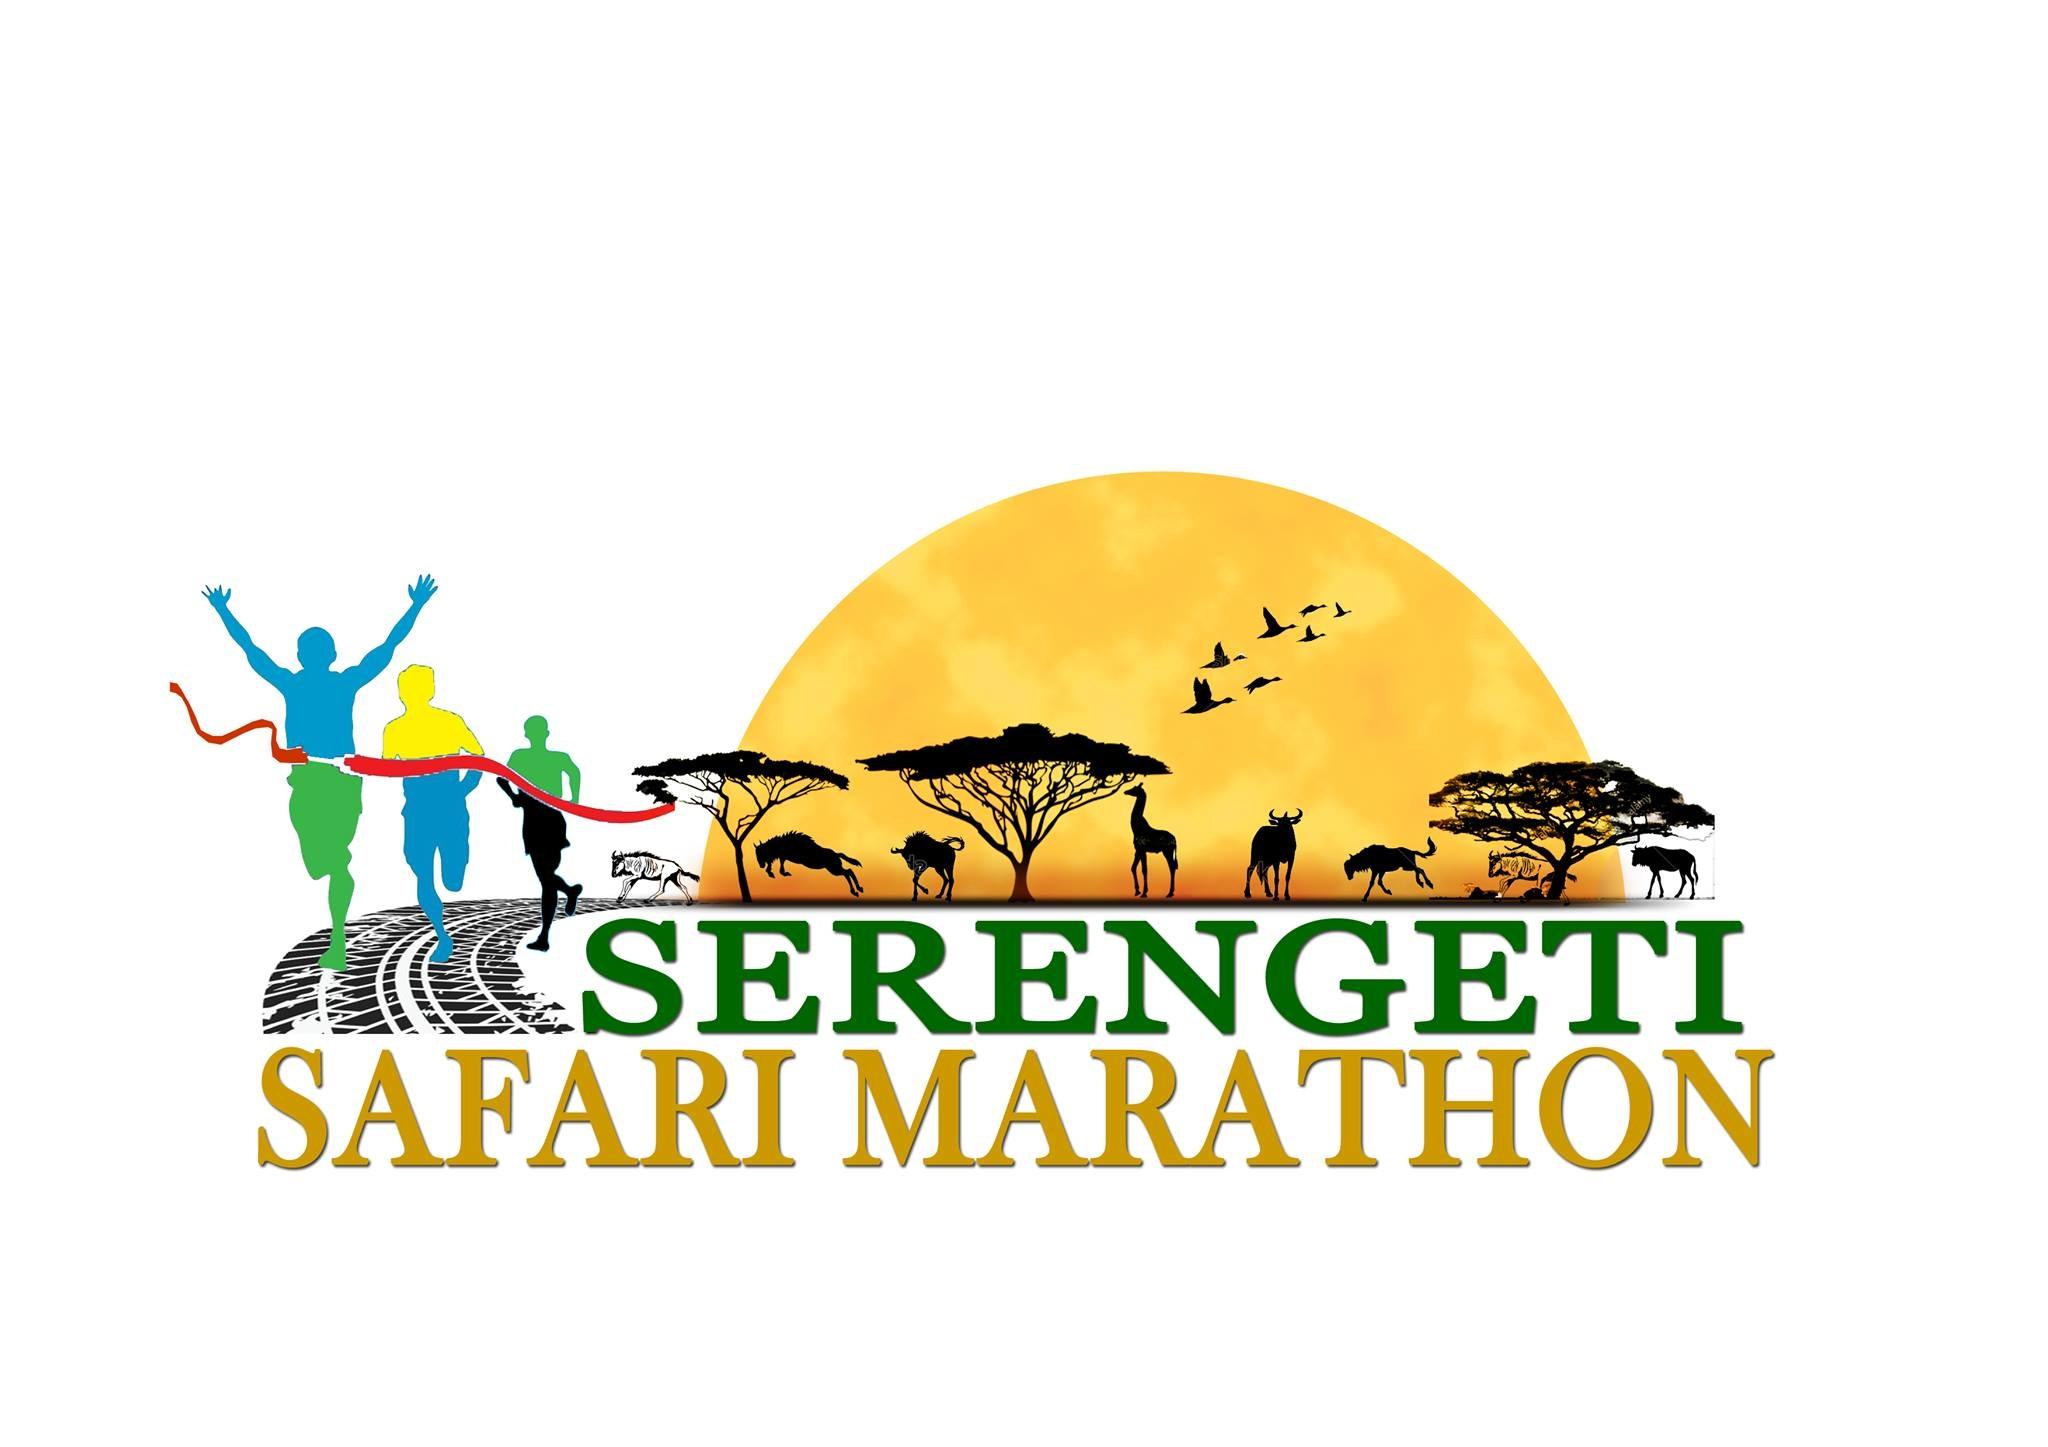 Serengeti Marathon